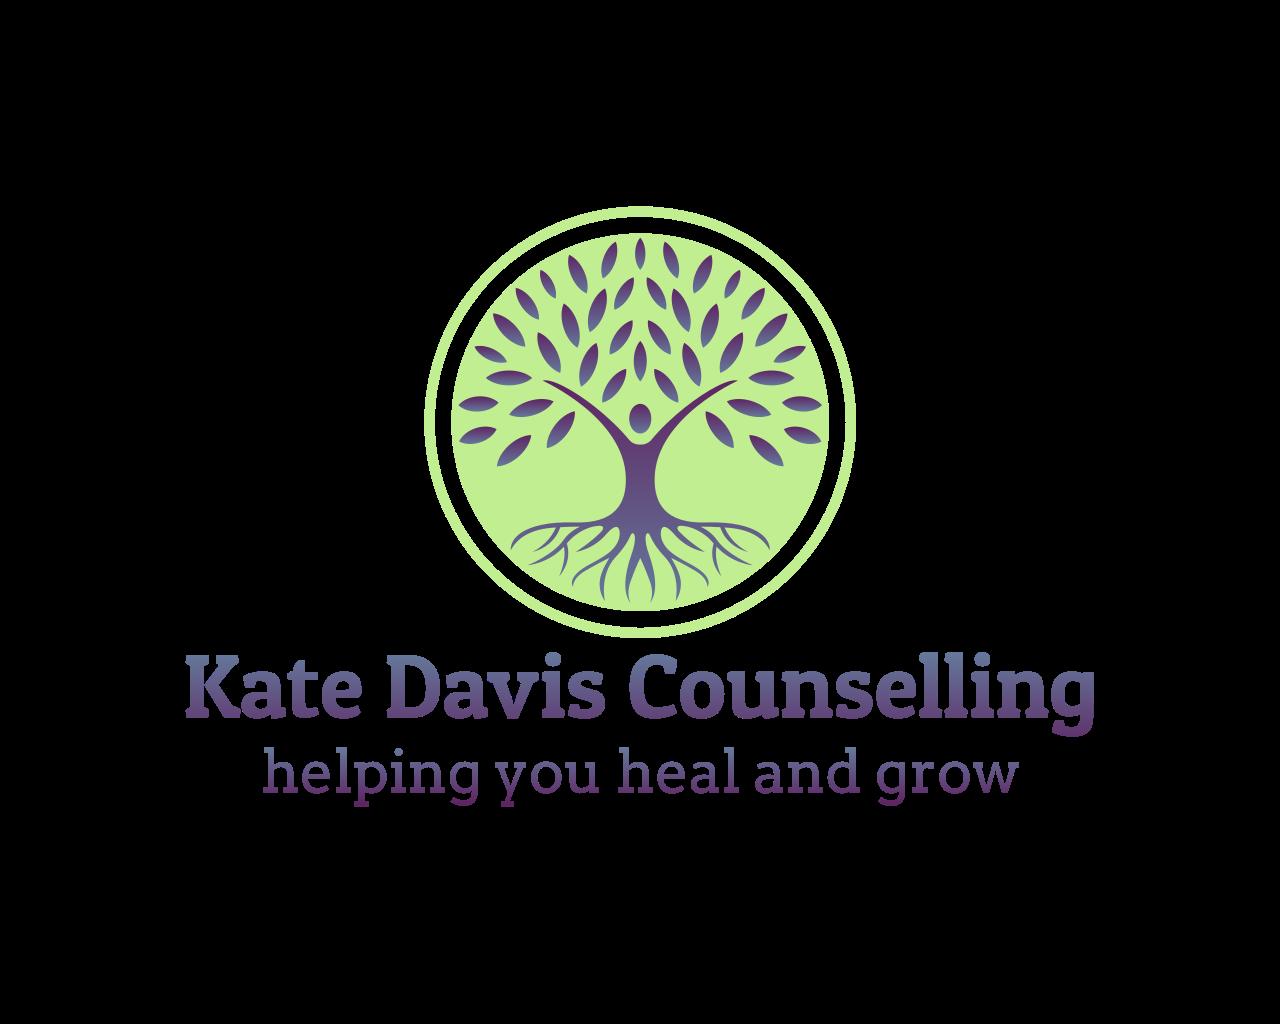 Kate Davis Counselling